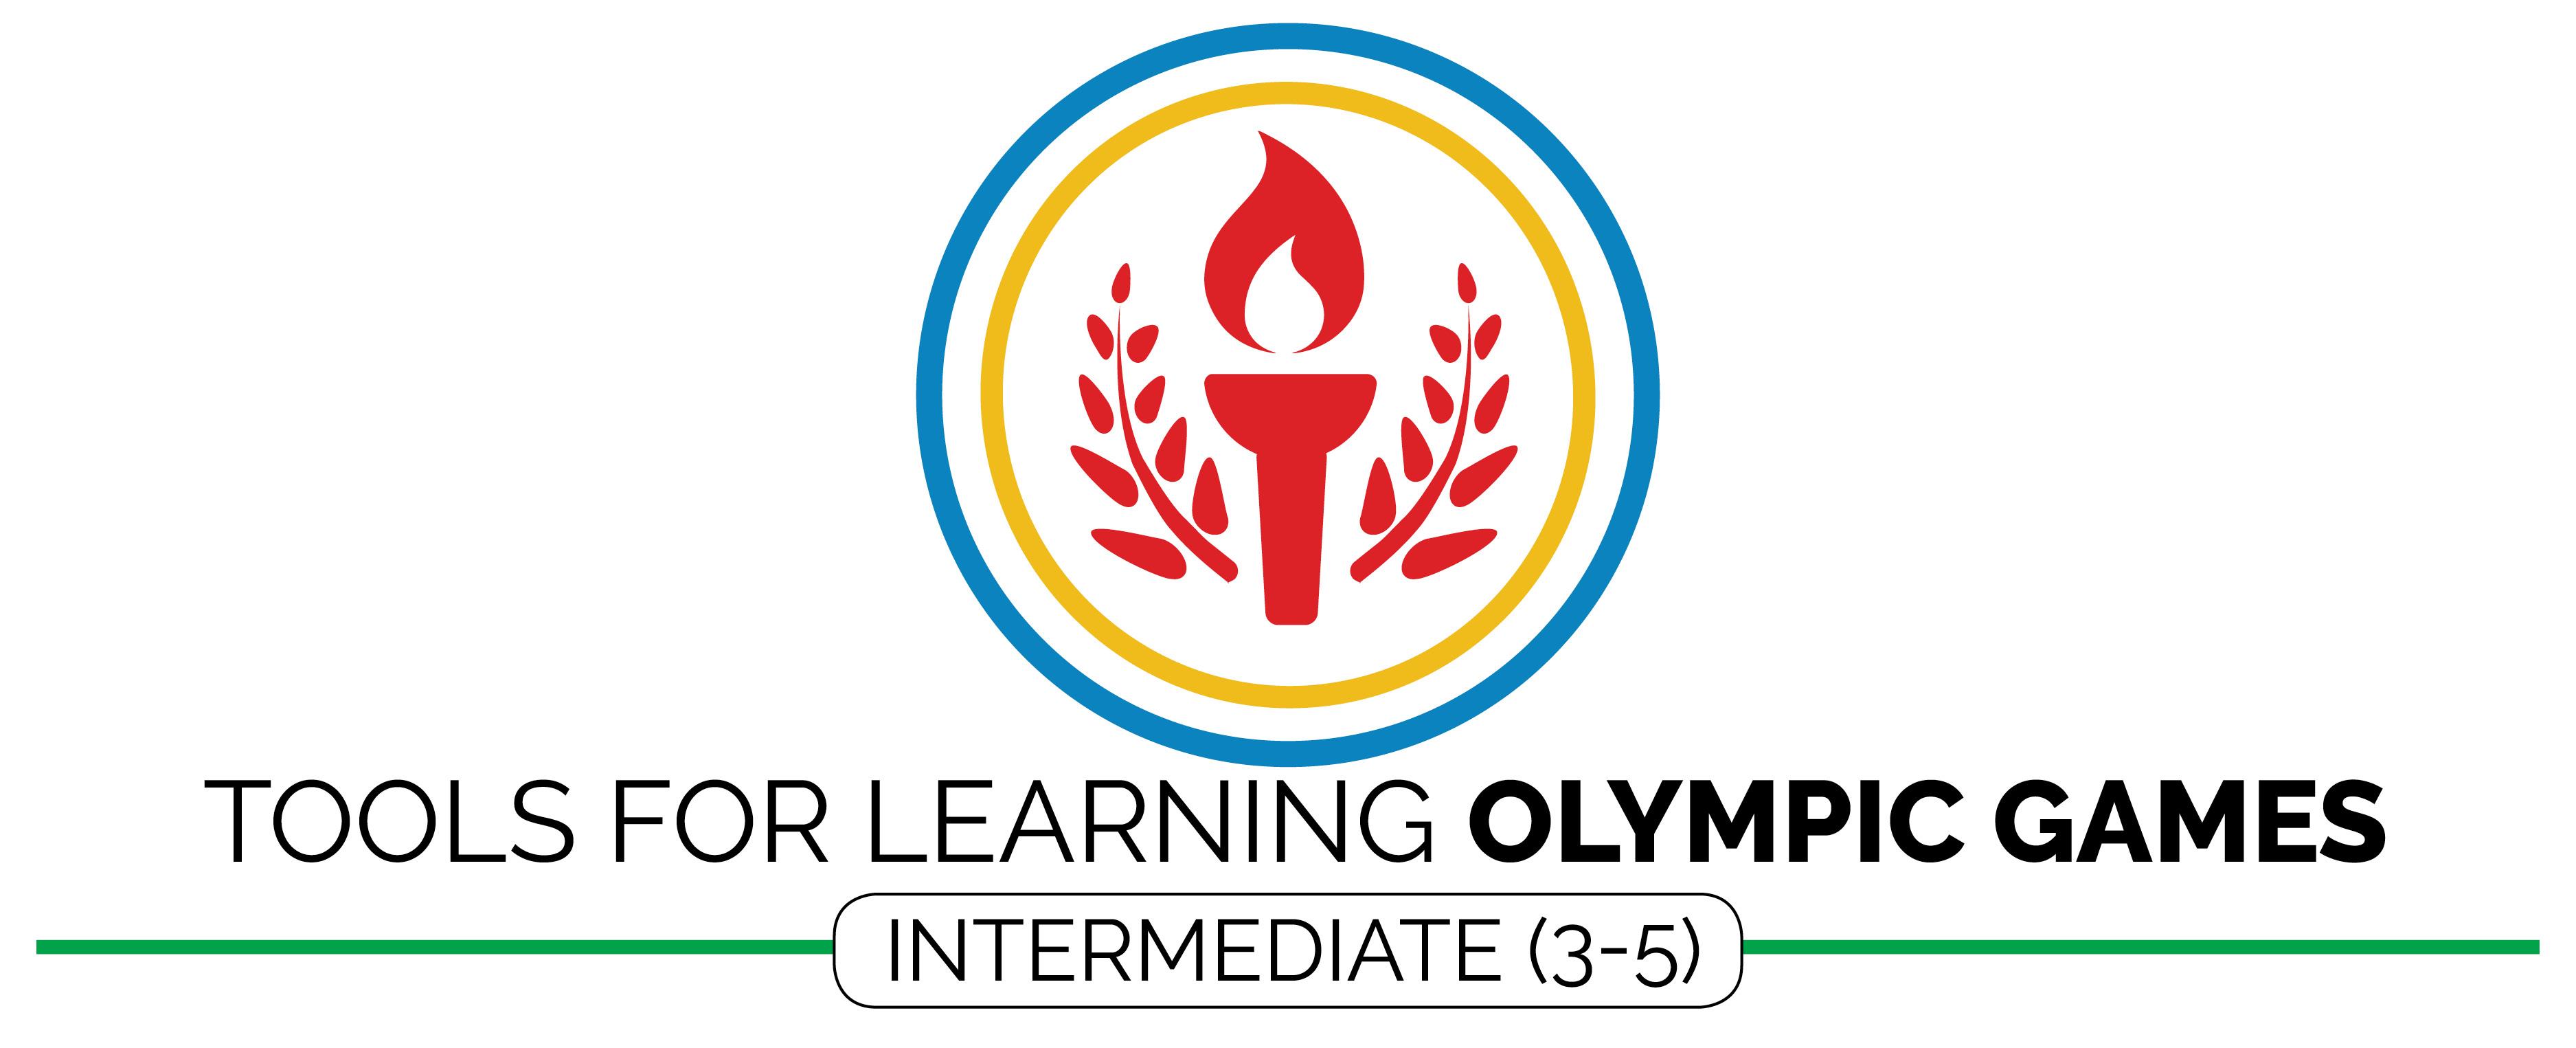 Olympics(Intermediate 3-5)